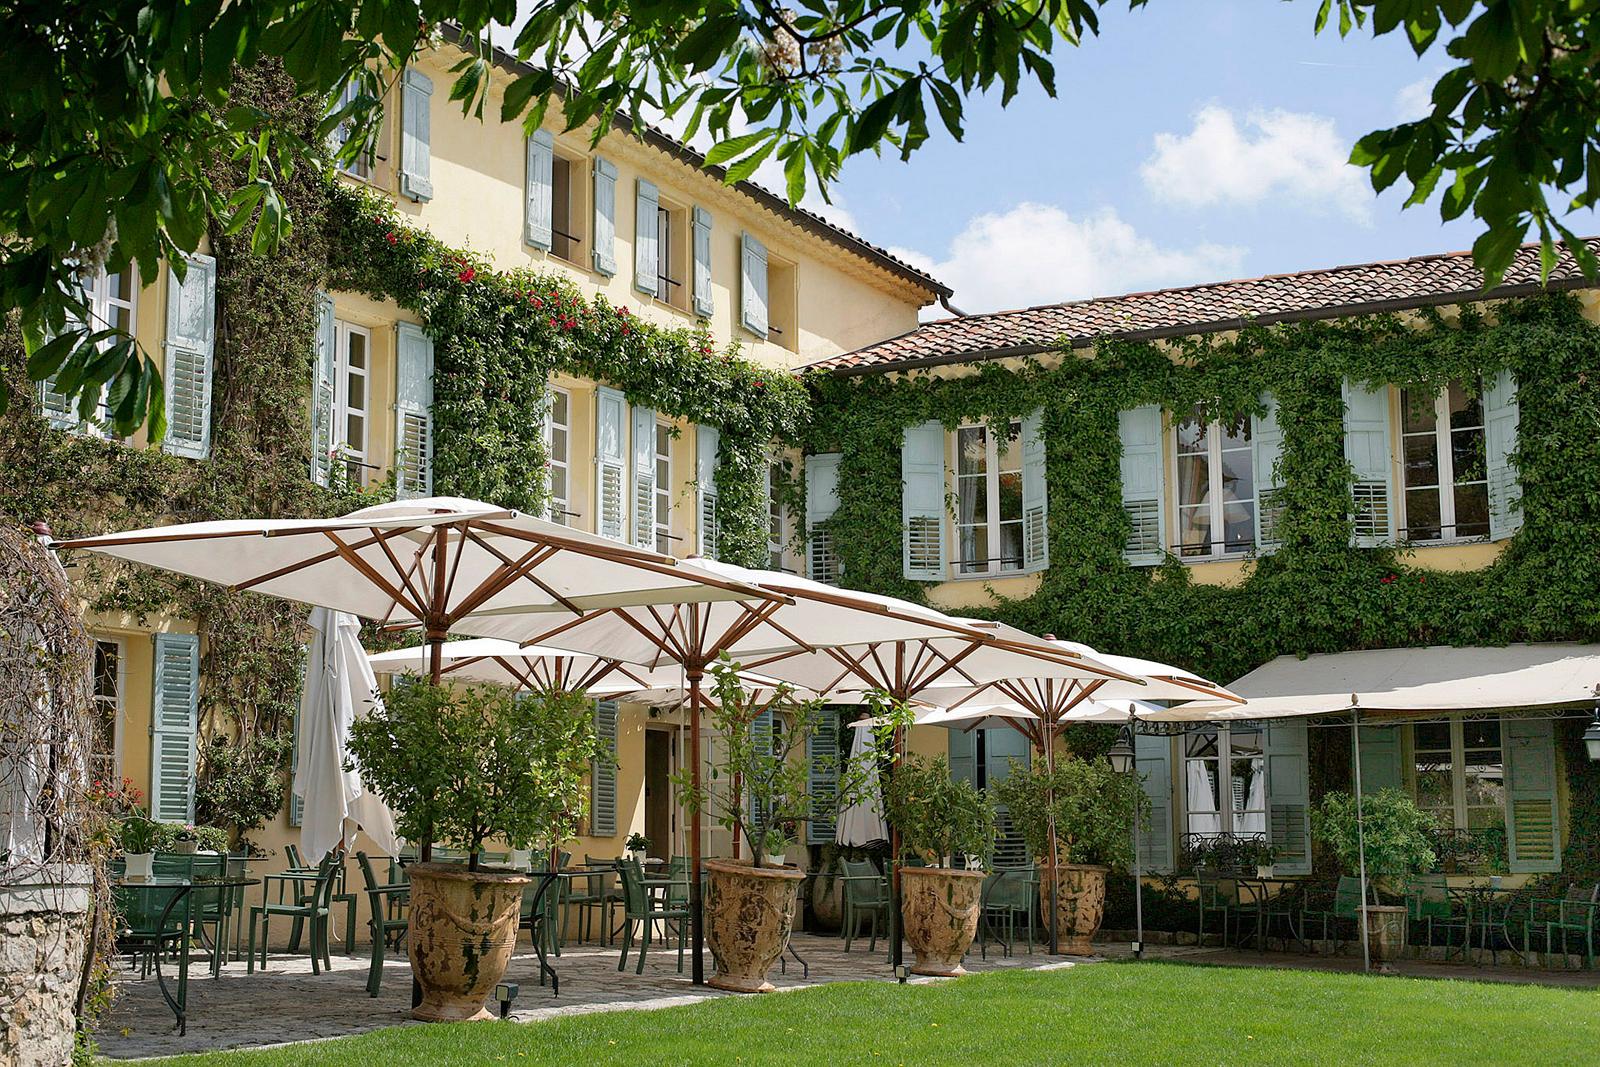 Ресторан La Bastide St Antoine (2 звезды мишлен), Грас (grasse)